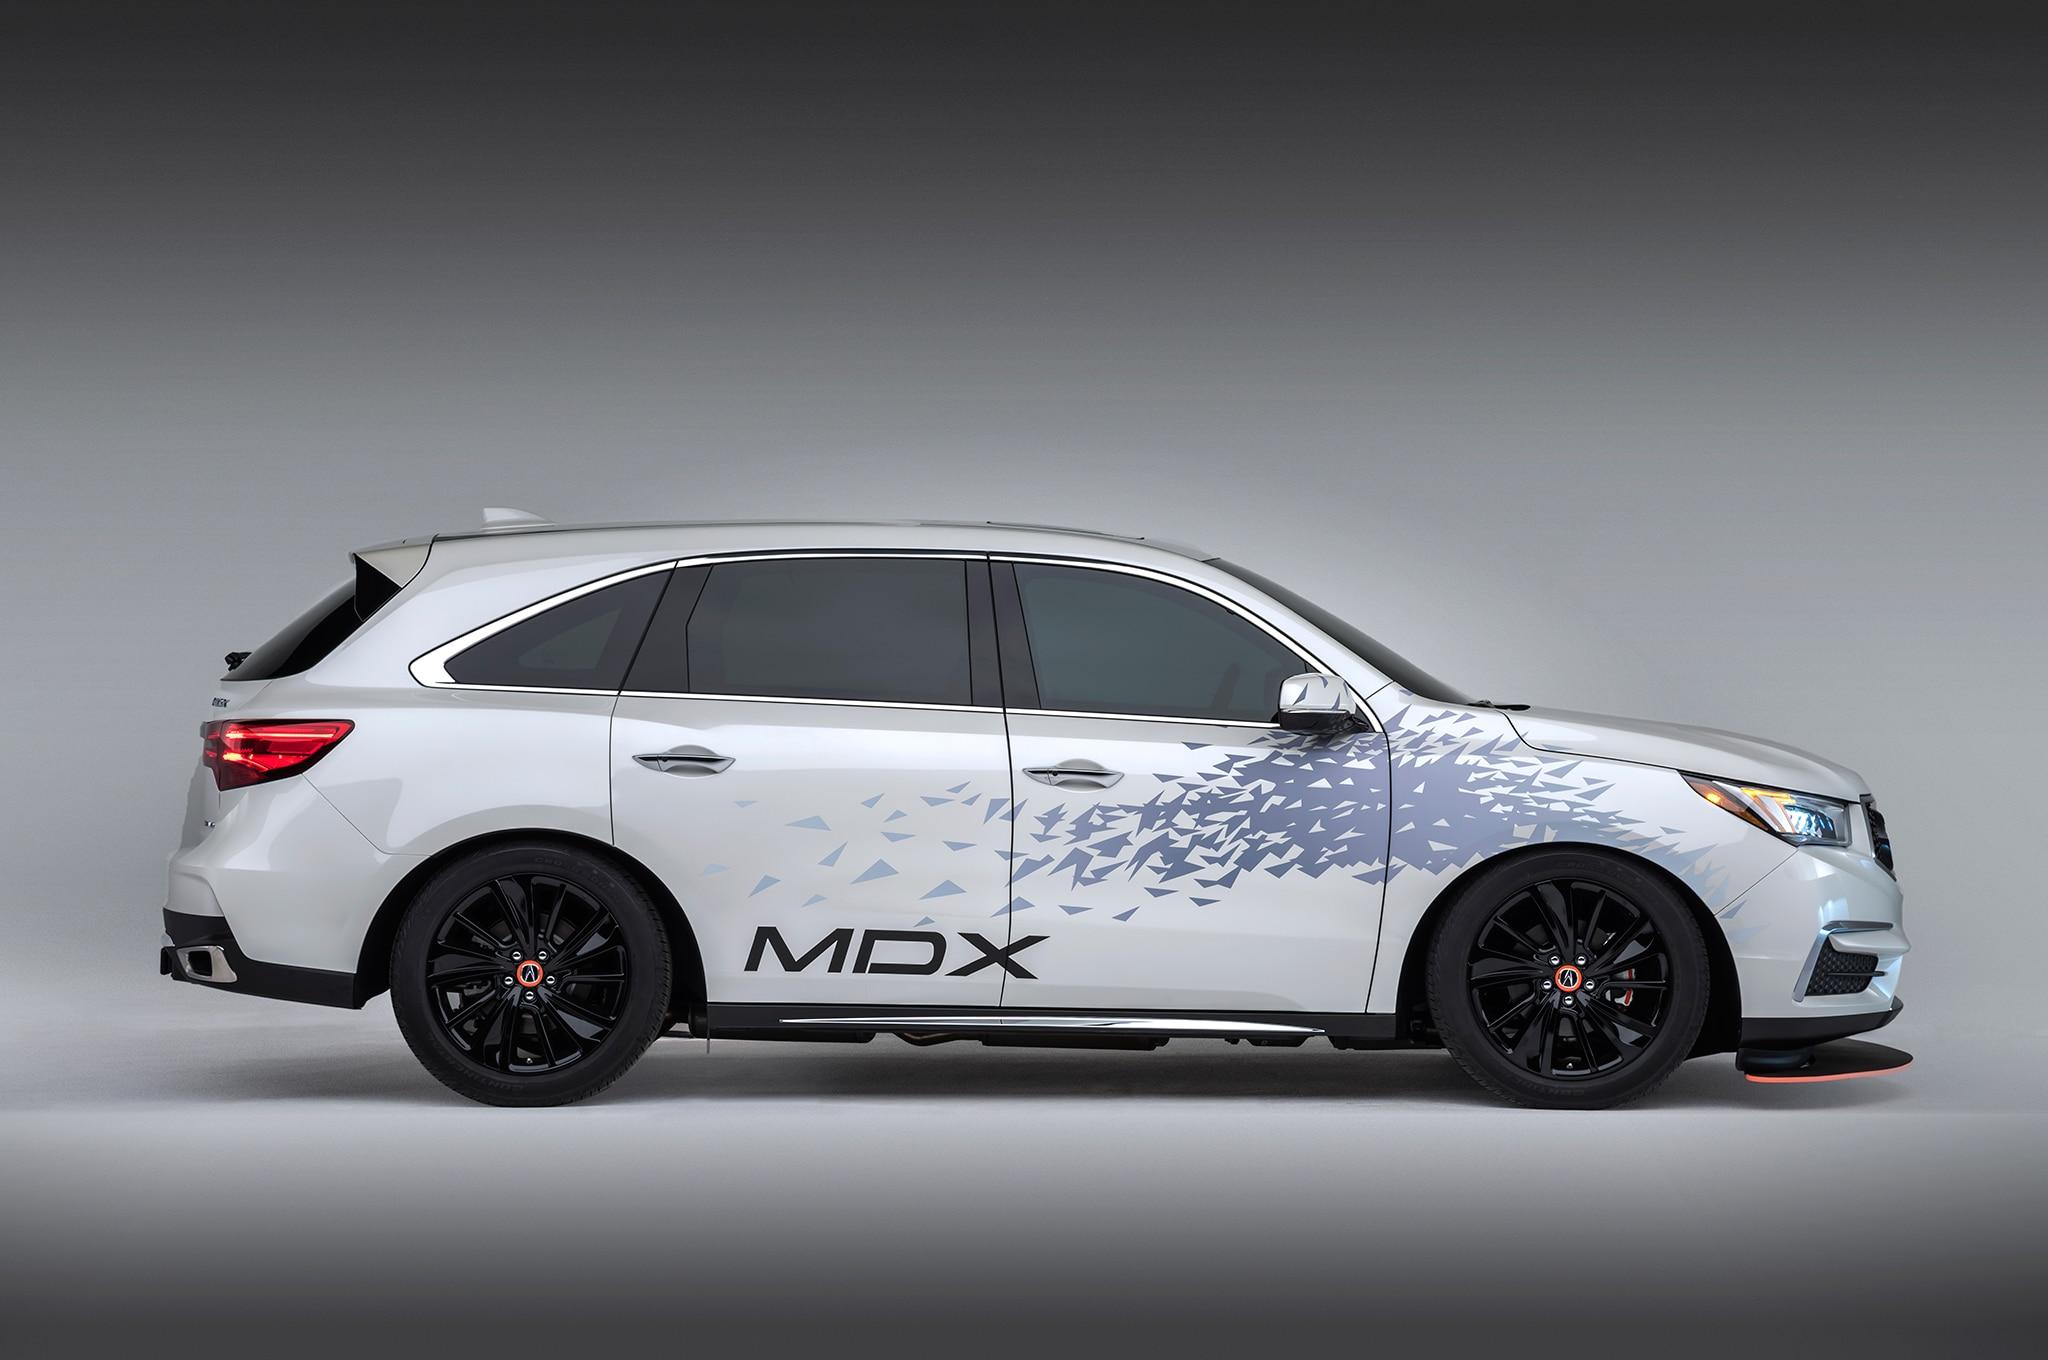 SEMA 2016: Customized Acura MDX to Tow NSX GT3 Racer | Automobile Magazine